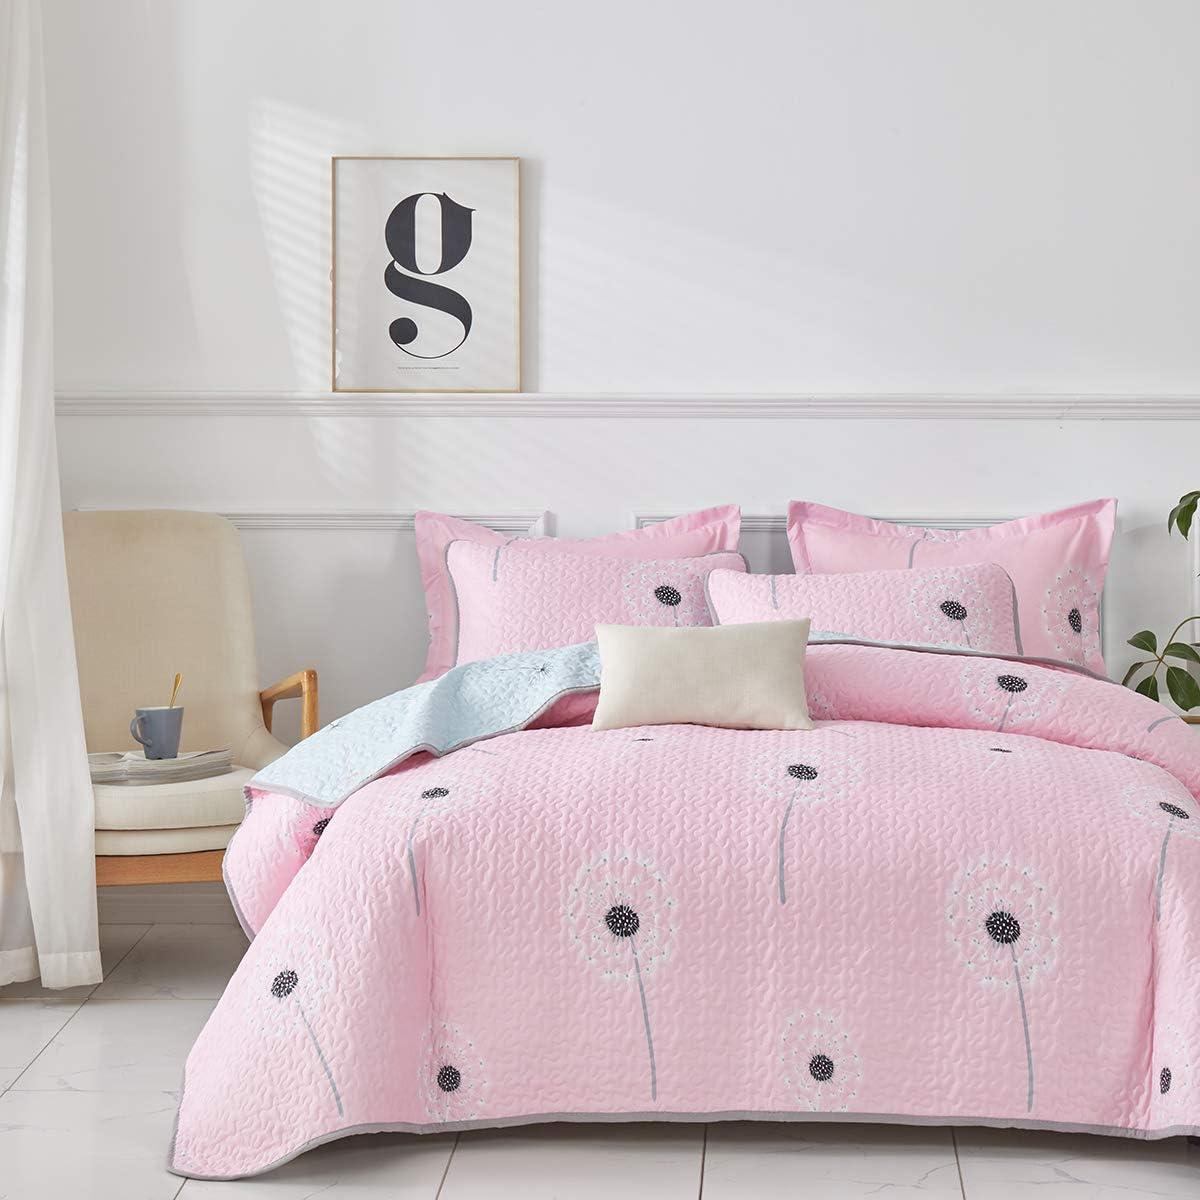 Uozzi Bedding 2 Piece Reversible Pink Dandelion Twin Quilt Set Cute Style Soft Microfiber Lightweight Women Girls Twin Summer Coverlet Bedspread for All Season